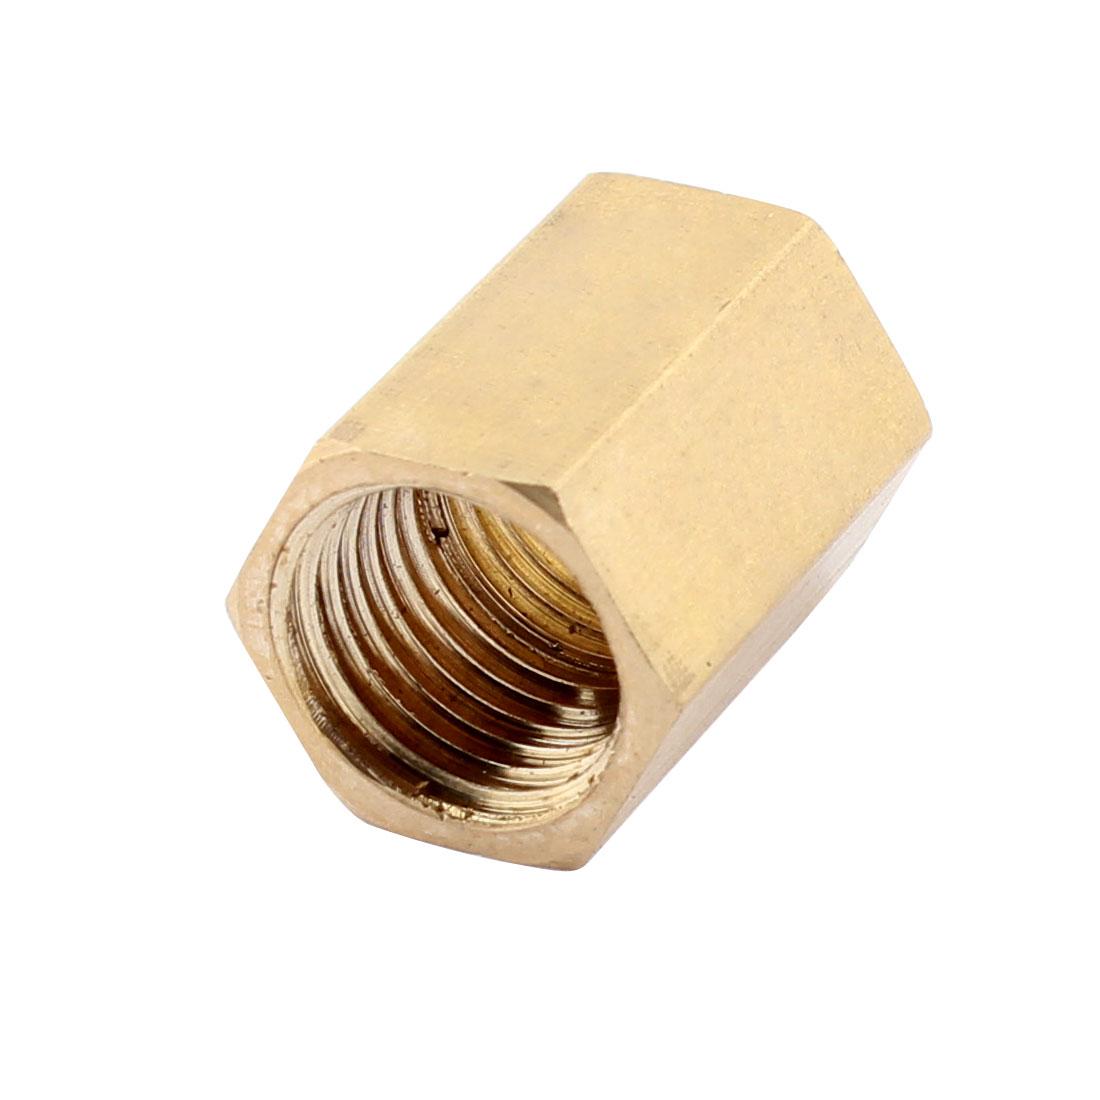 7/16 BSP Female Thread 20mm Length Dual Ends Brass Pillar Pipe Connector